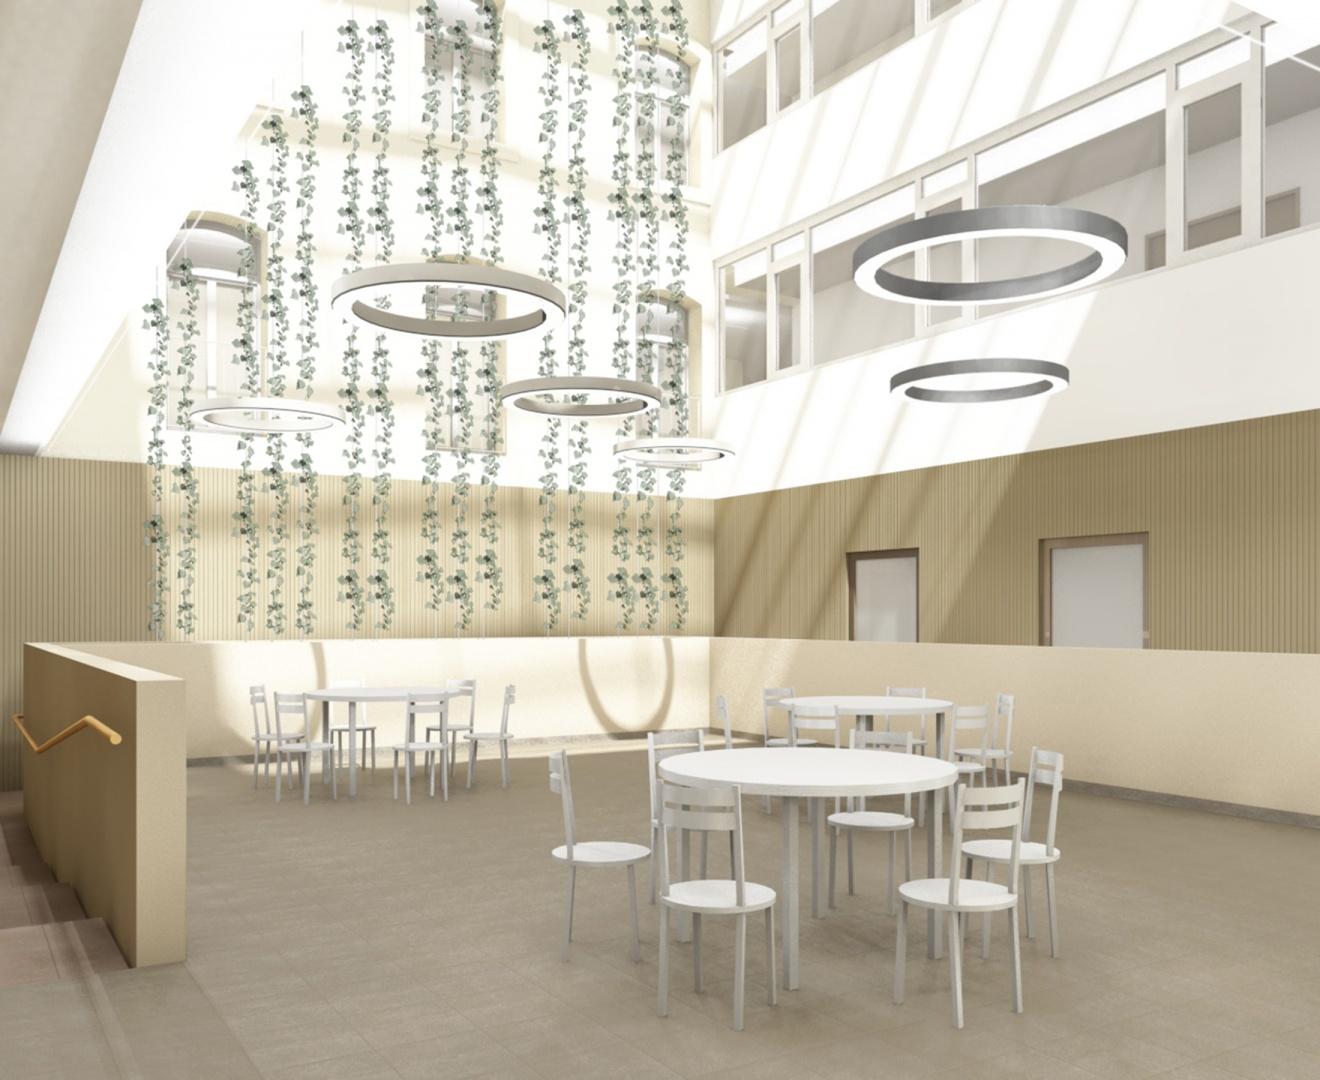 Oberried Innenhof Cafeteria © matti ragaz hitz architekten ag